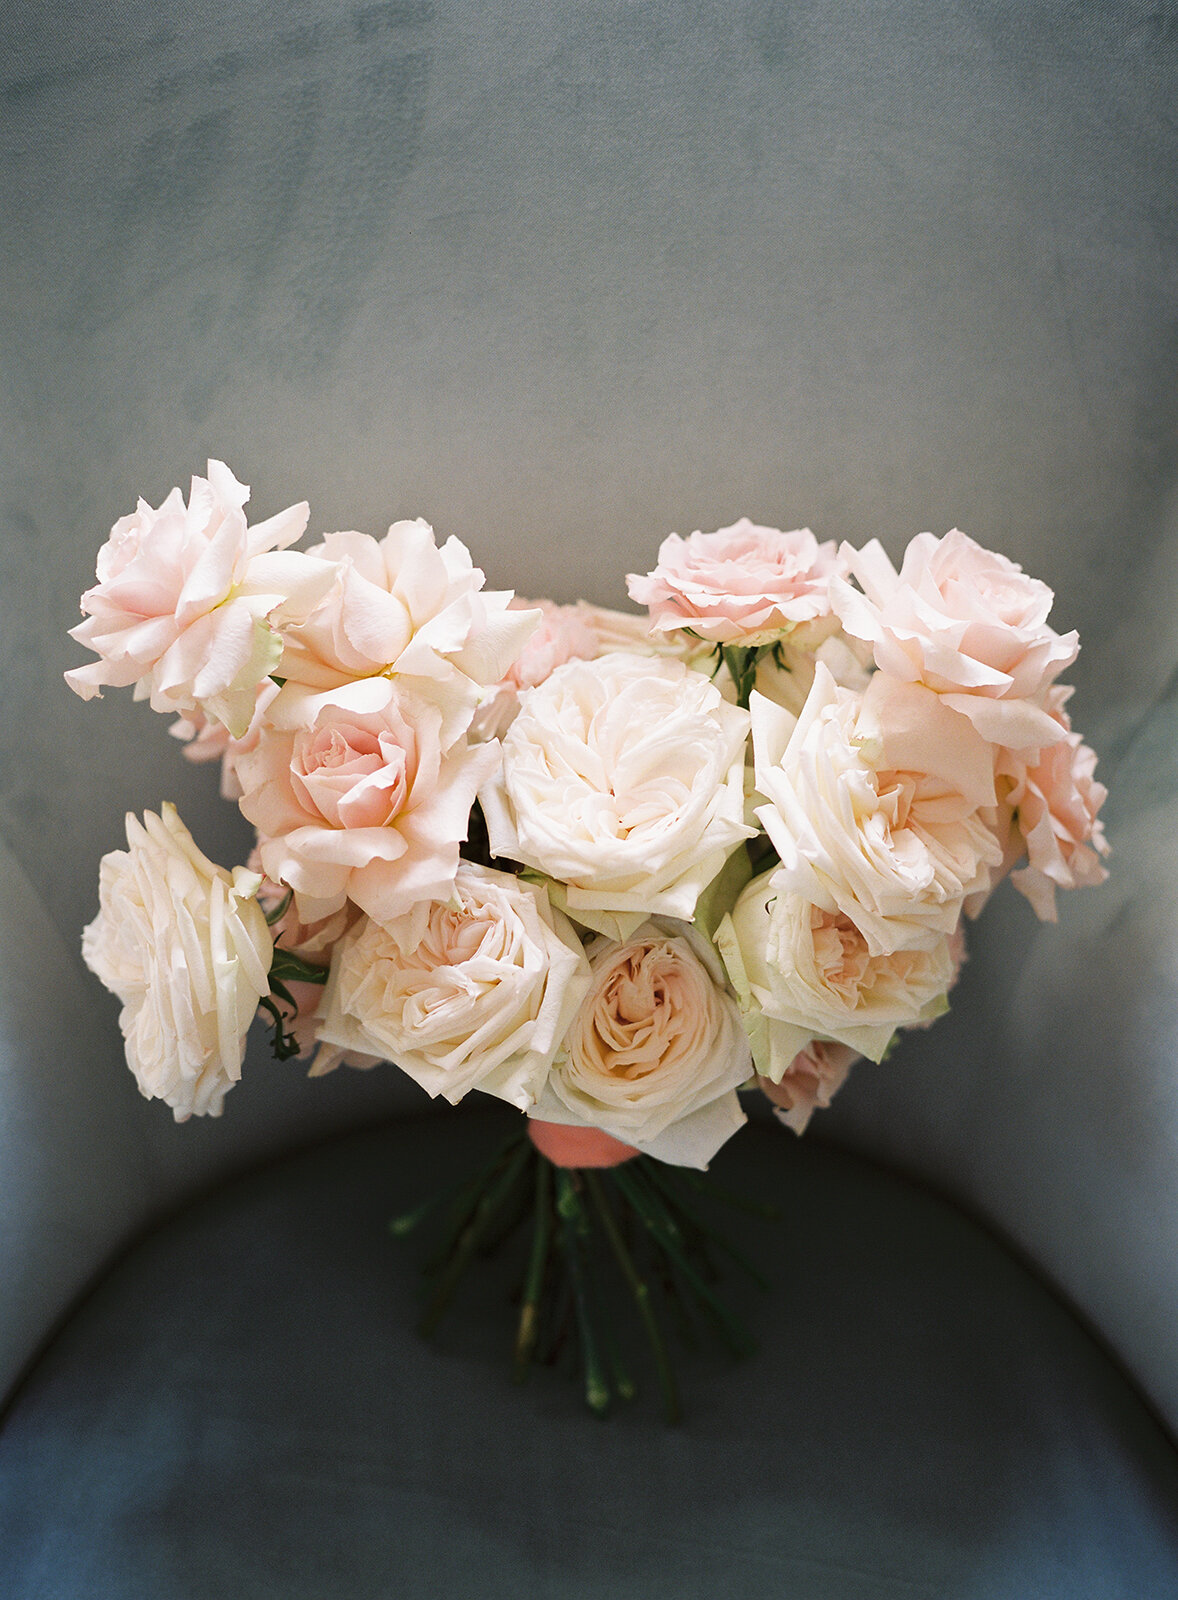 Pink-Garden-Rose-Bouquet-williamsburg-photo-studios